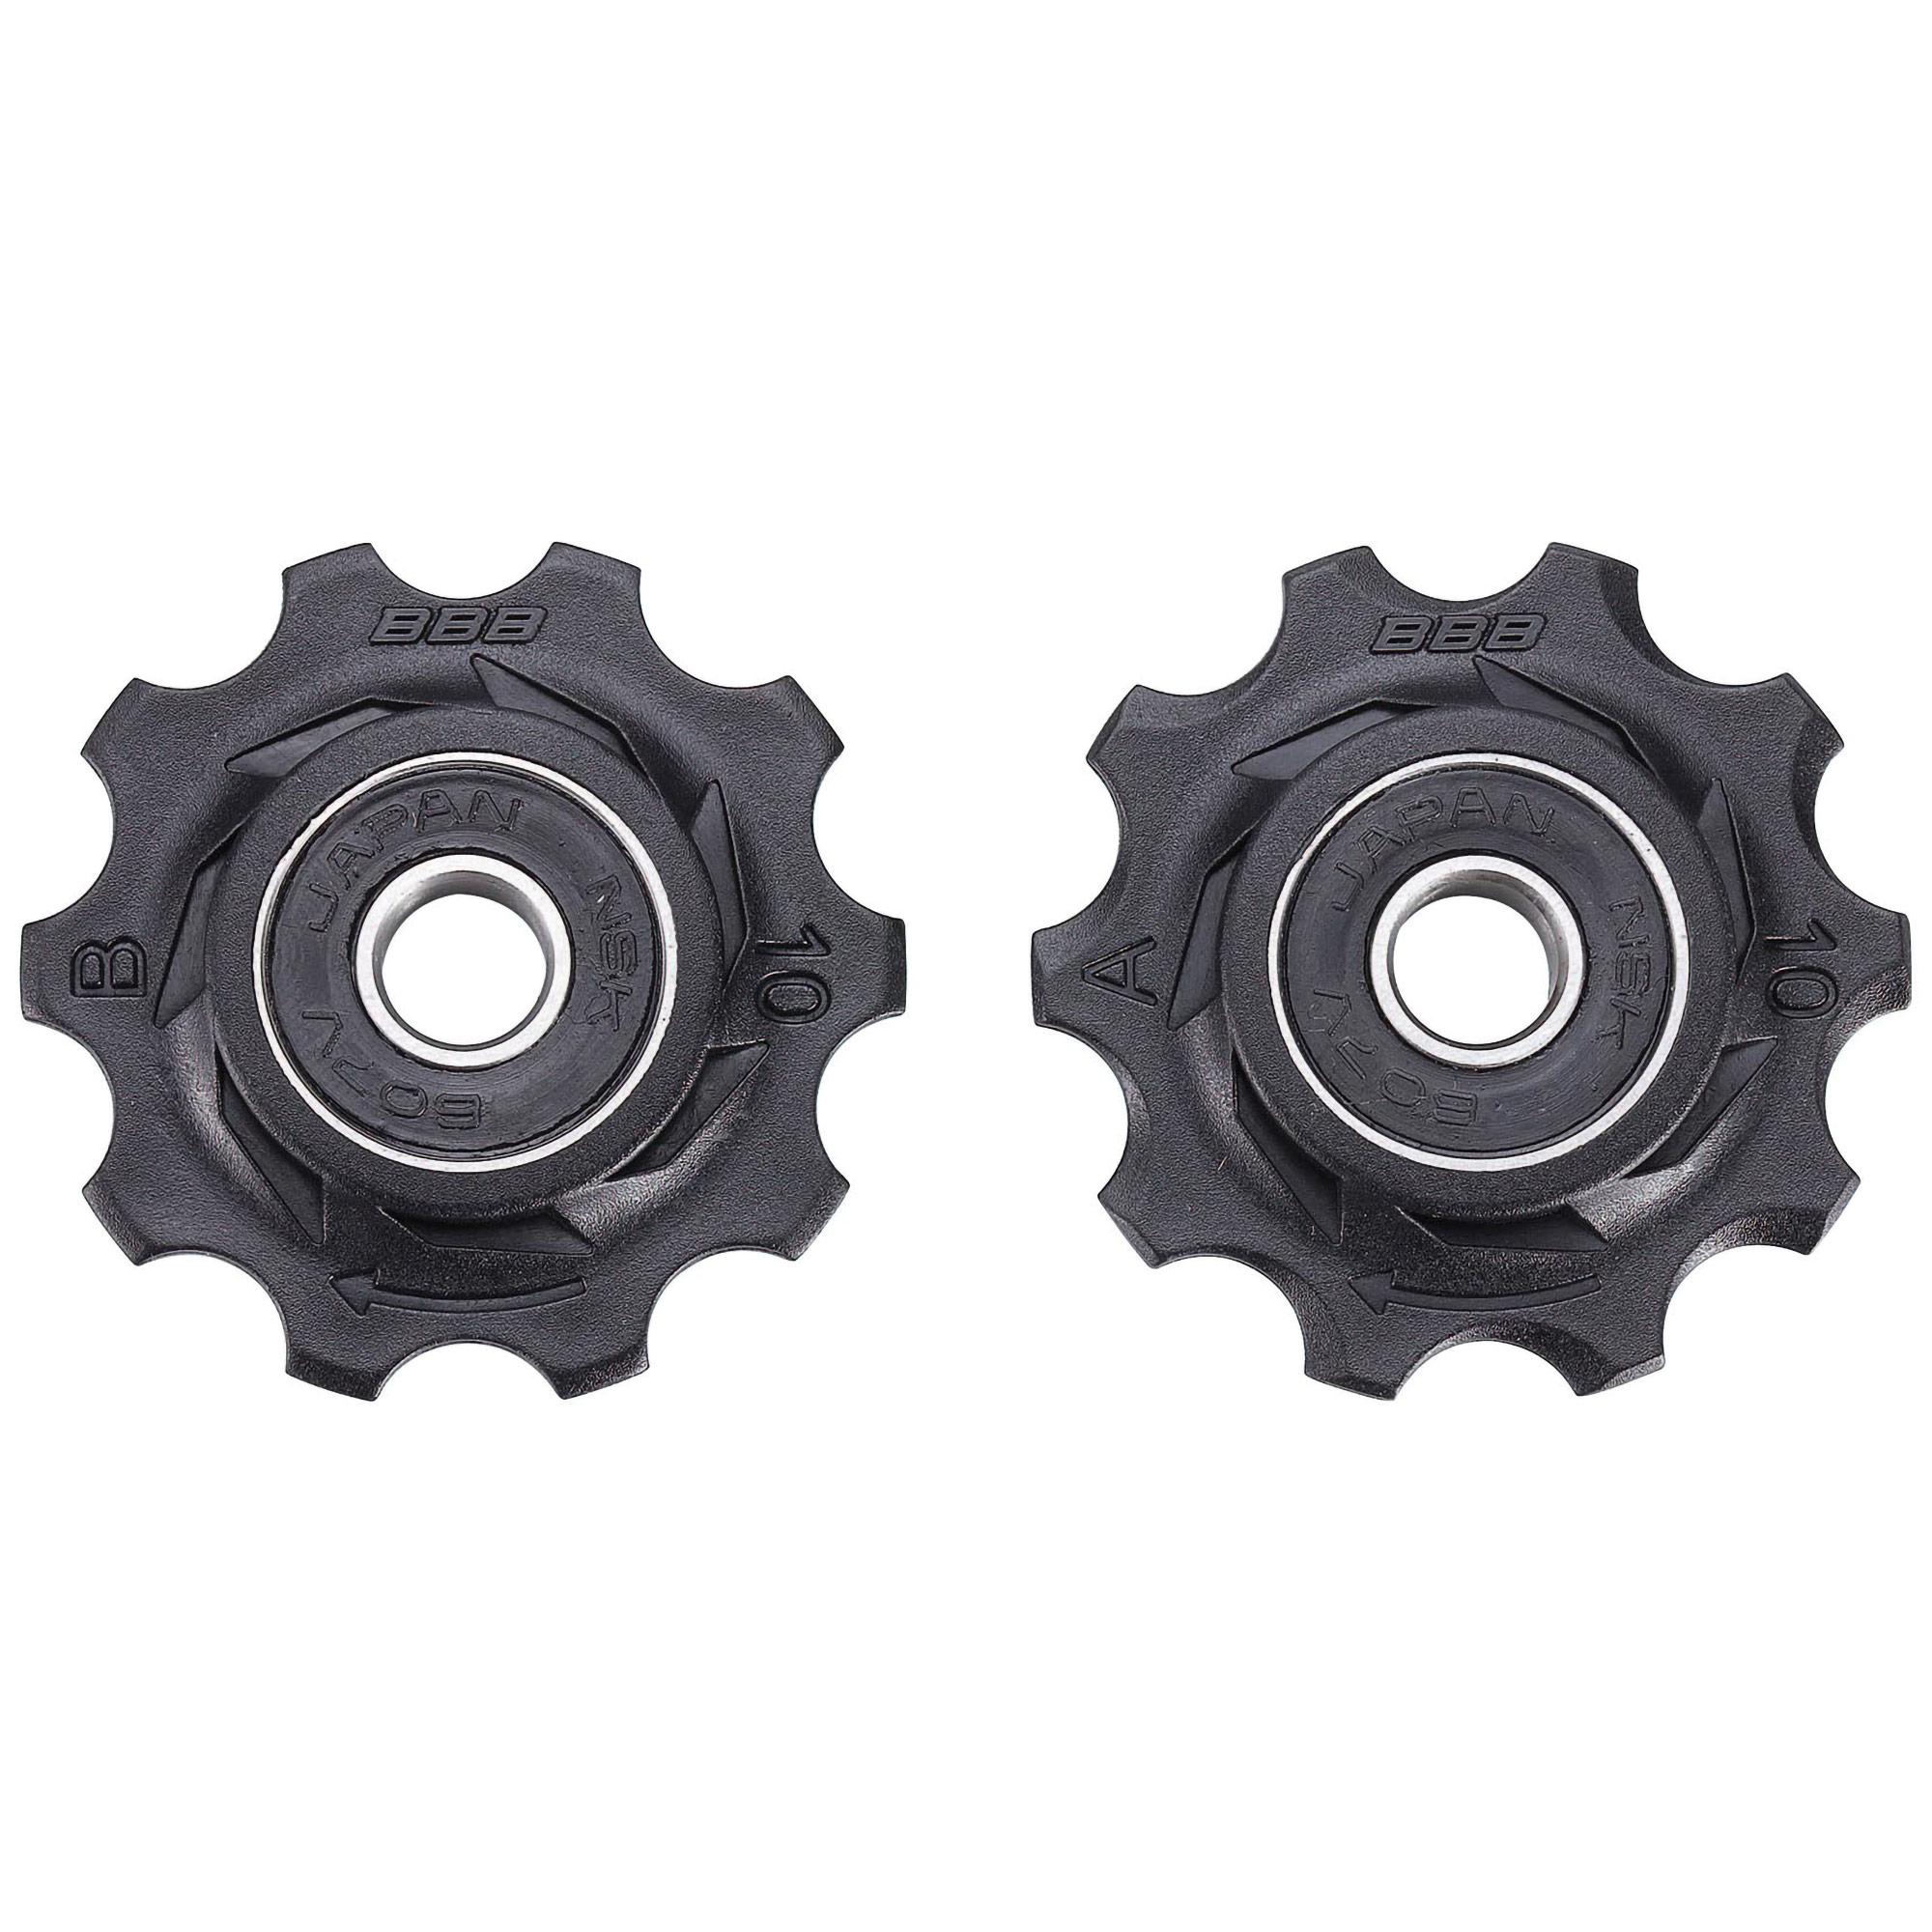 BBB Rollerboys Bike//Cycling Jockey Wheels